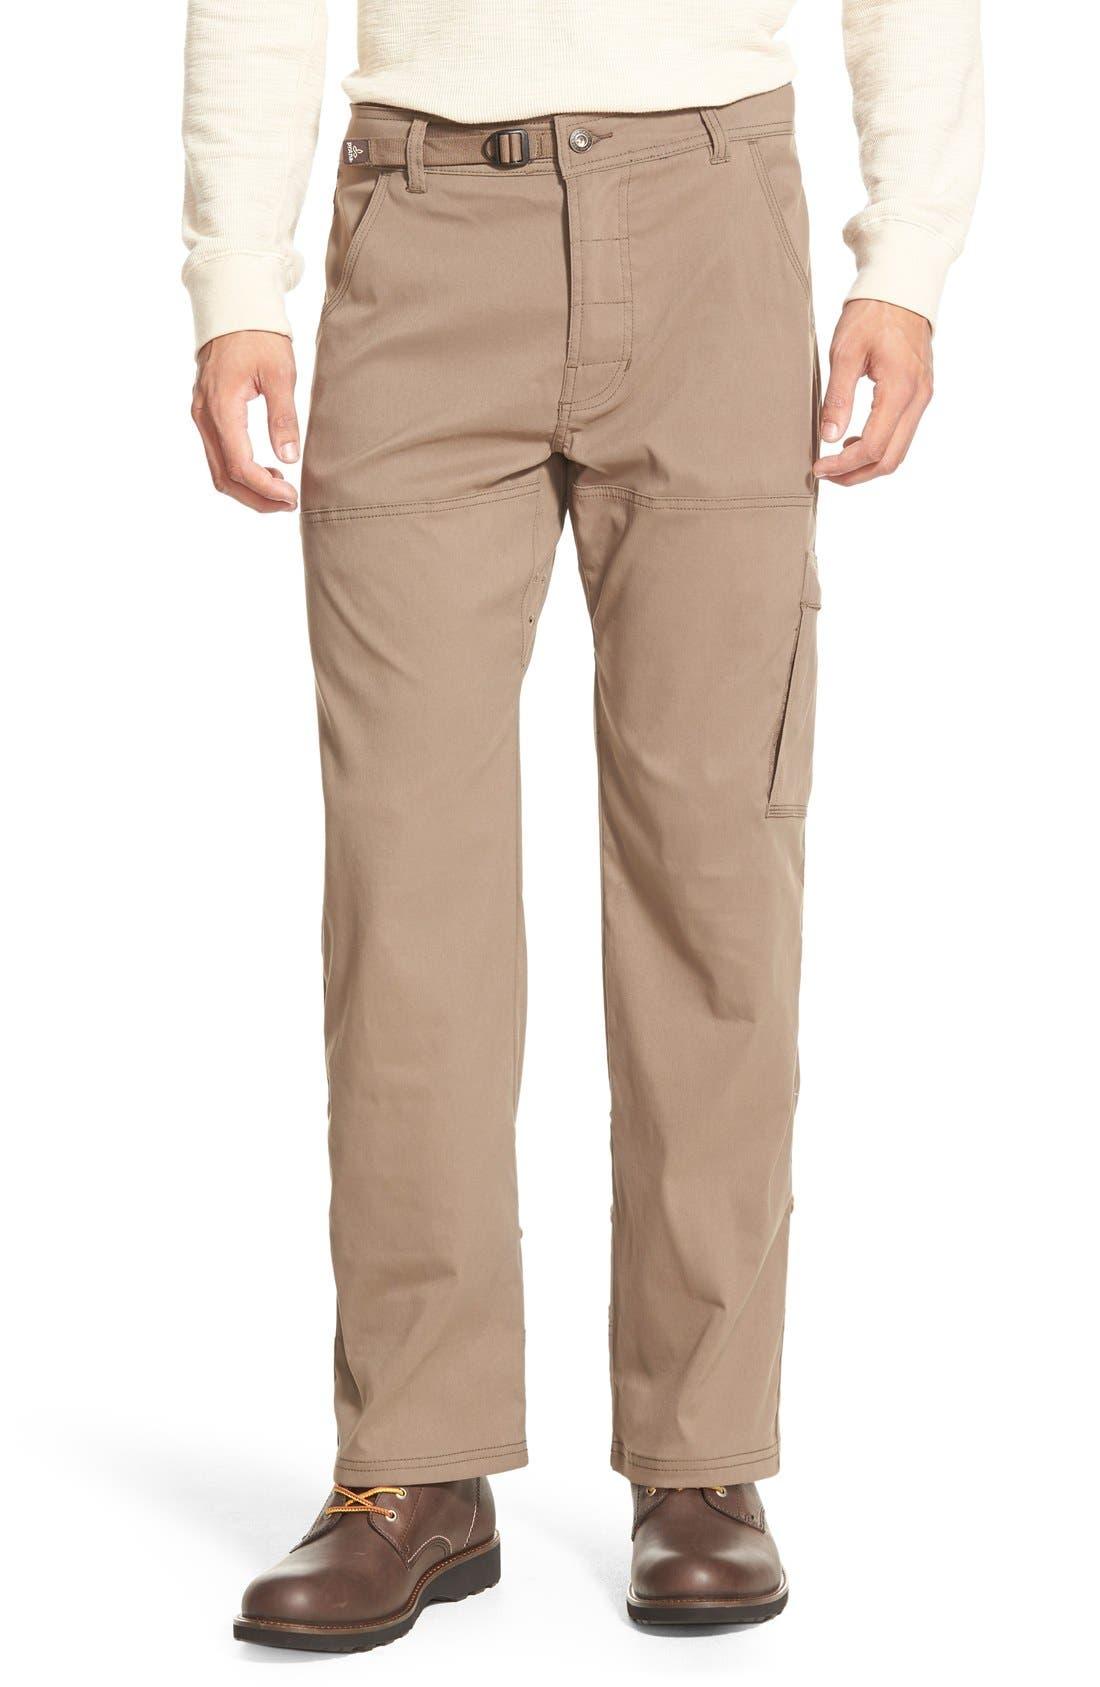 Zion Stretch Pants,                         Main,                         color, Mud